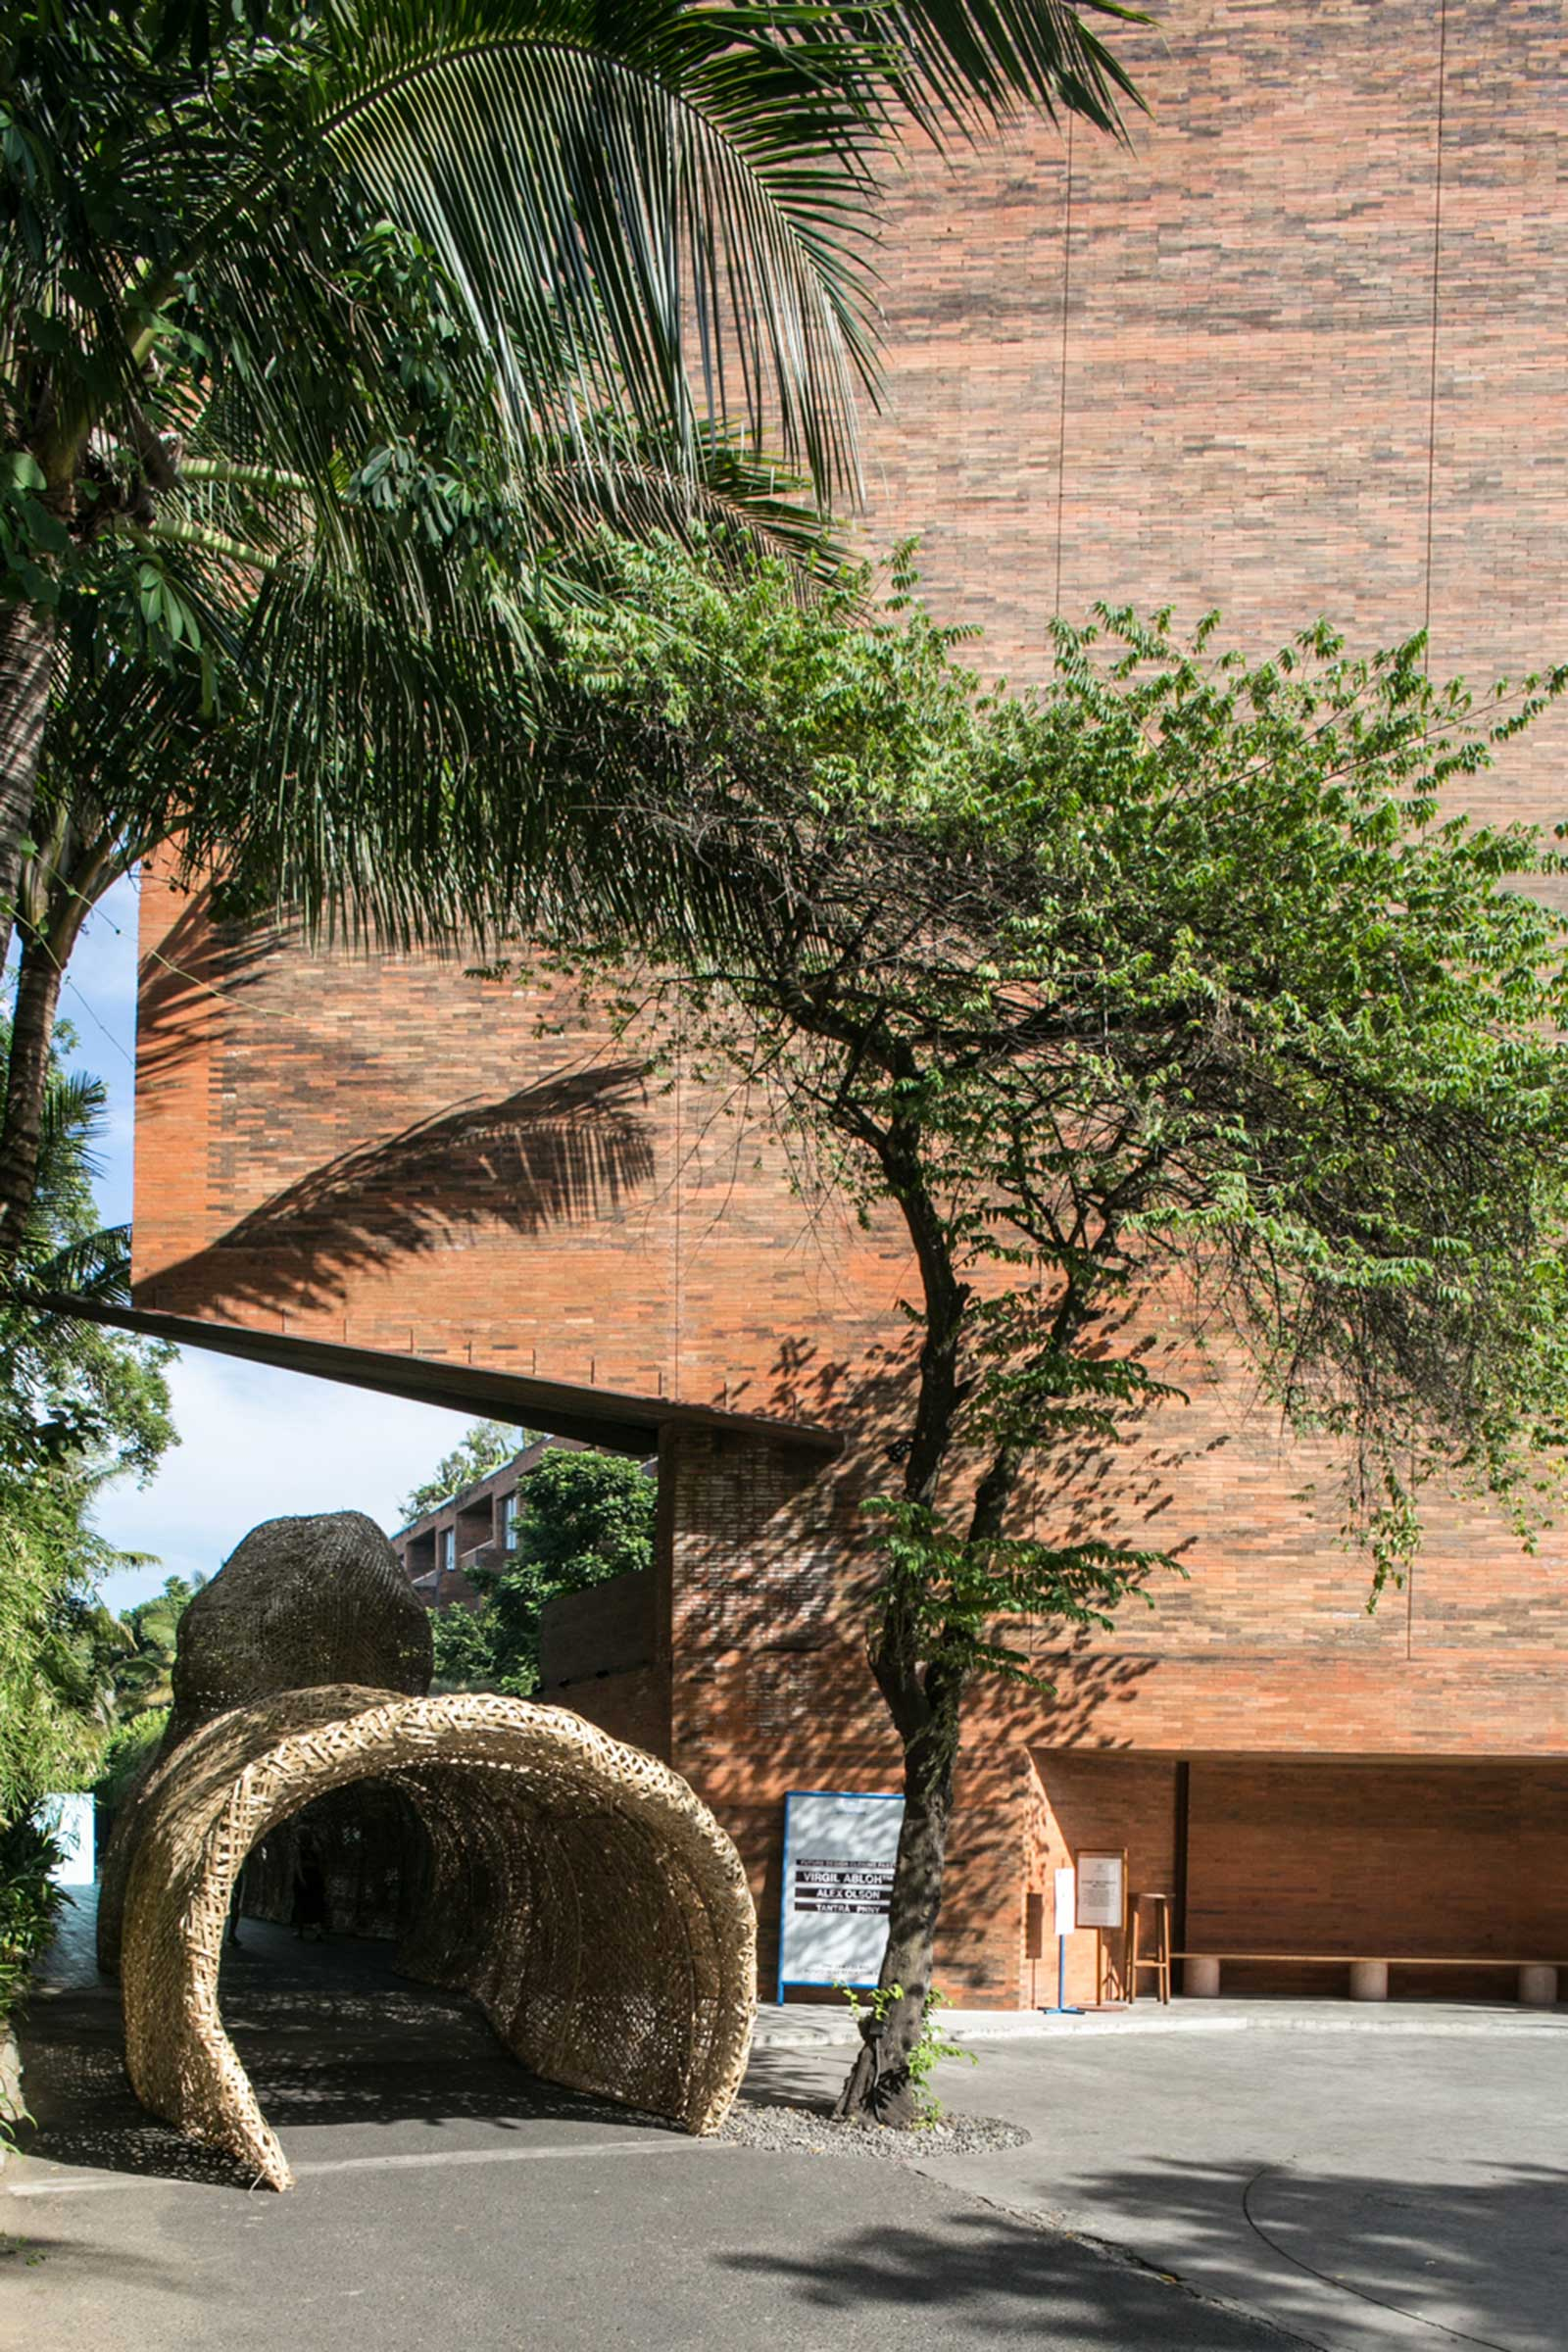 The nano UHERO bamboo tunnel installation beside the distinctive red-brick Katamama